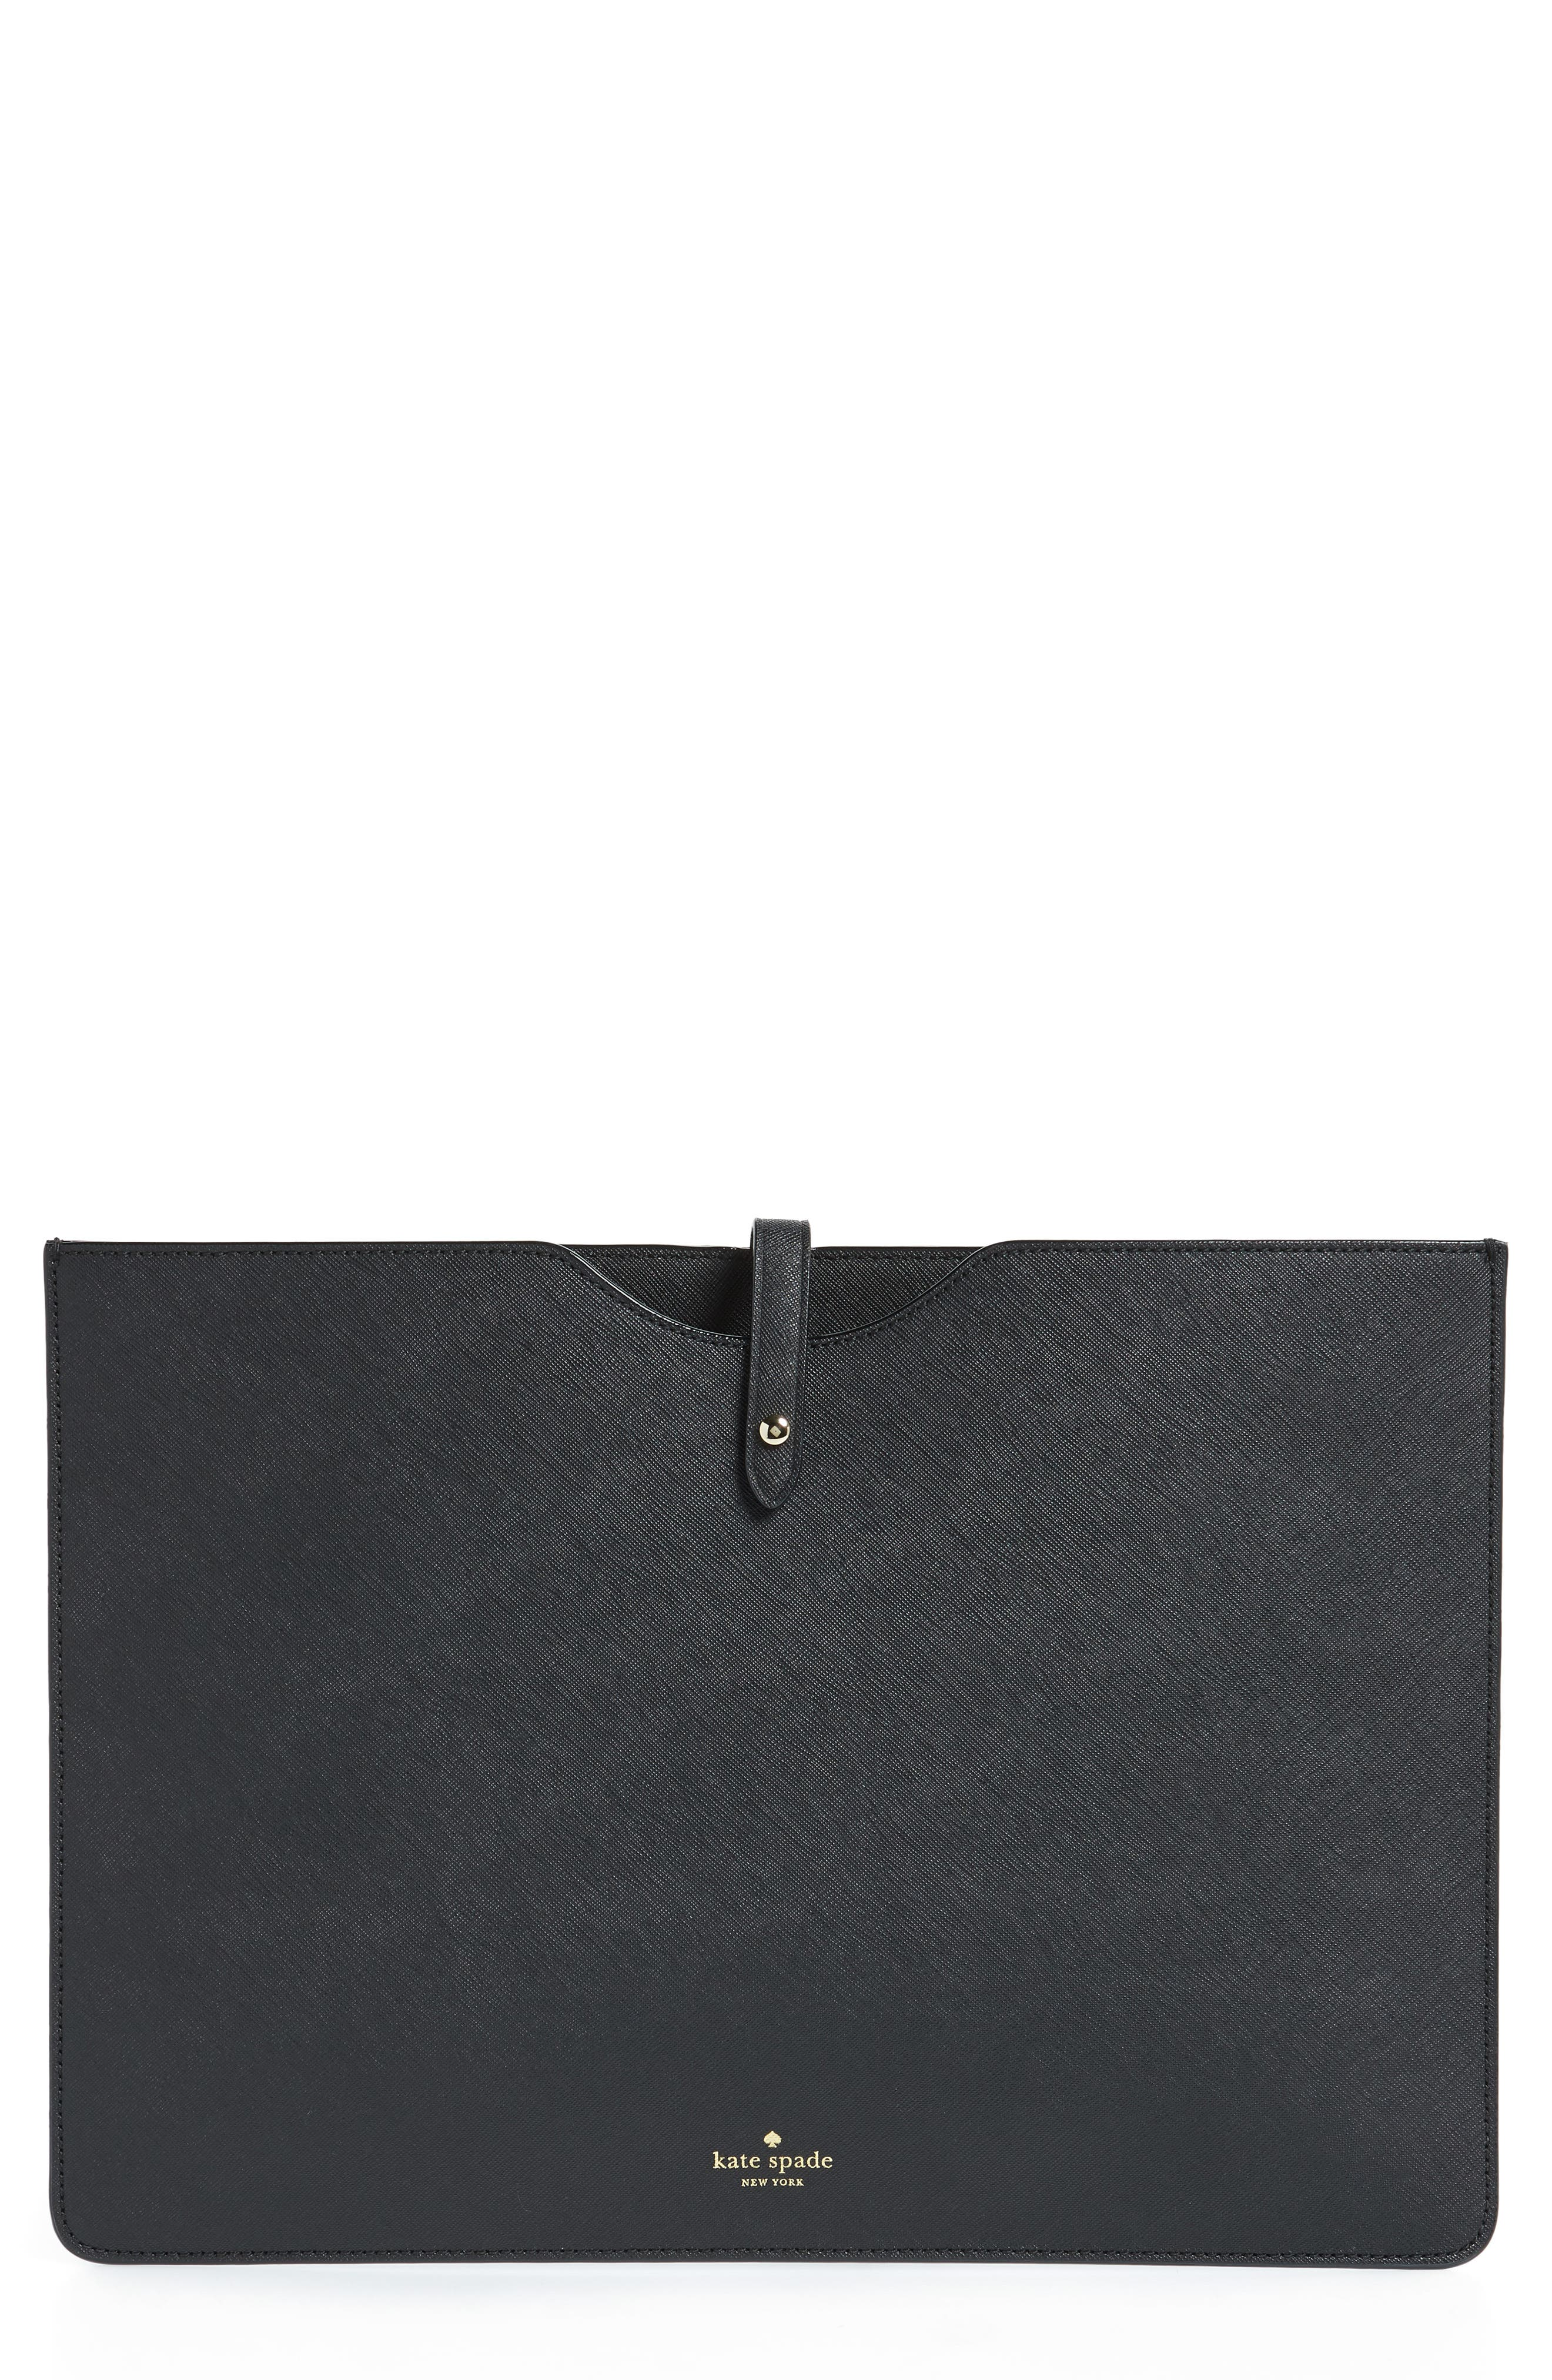 kate spade new york 13-inch saffiano laptop sleeve